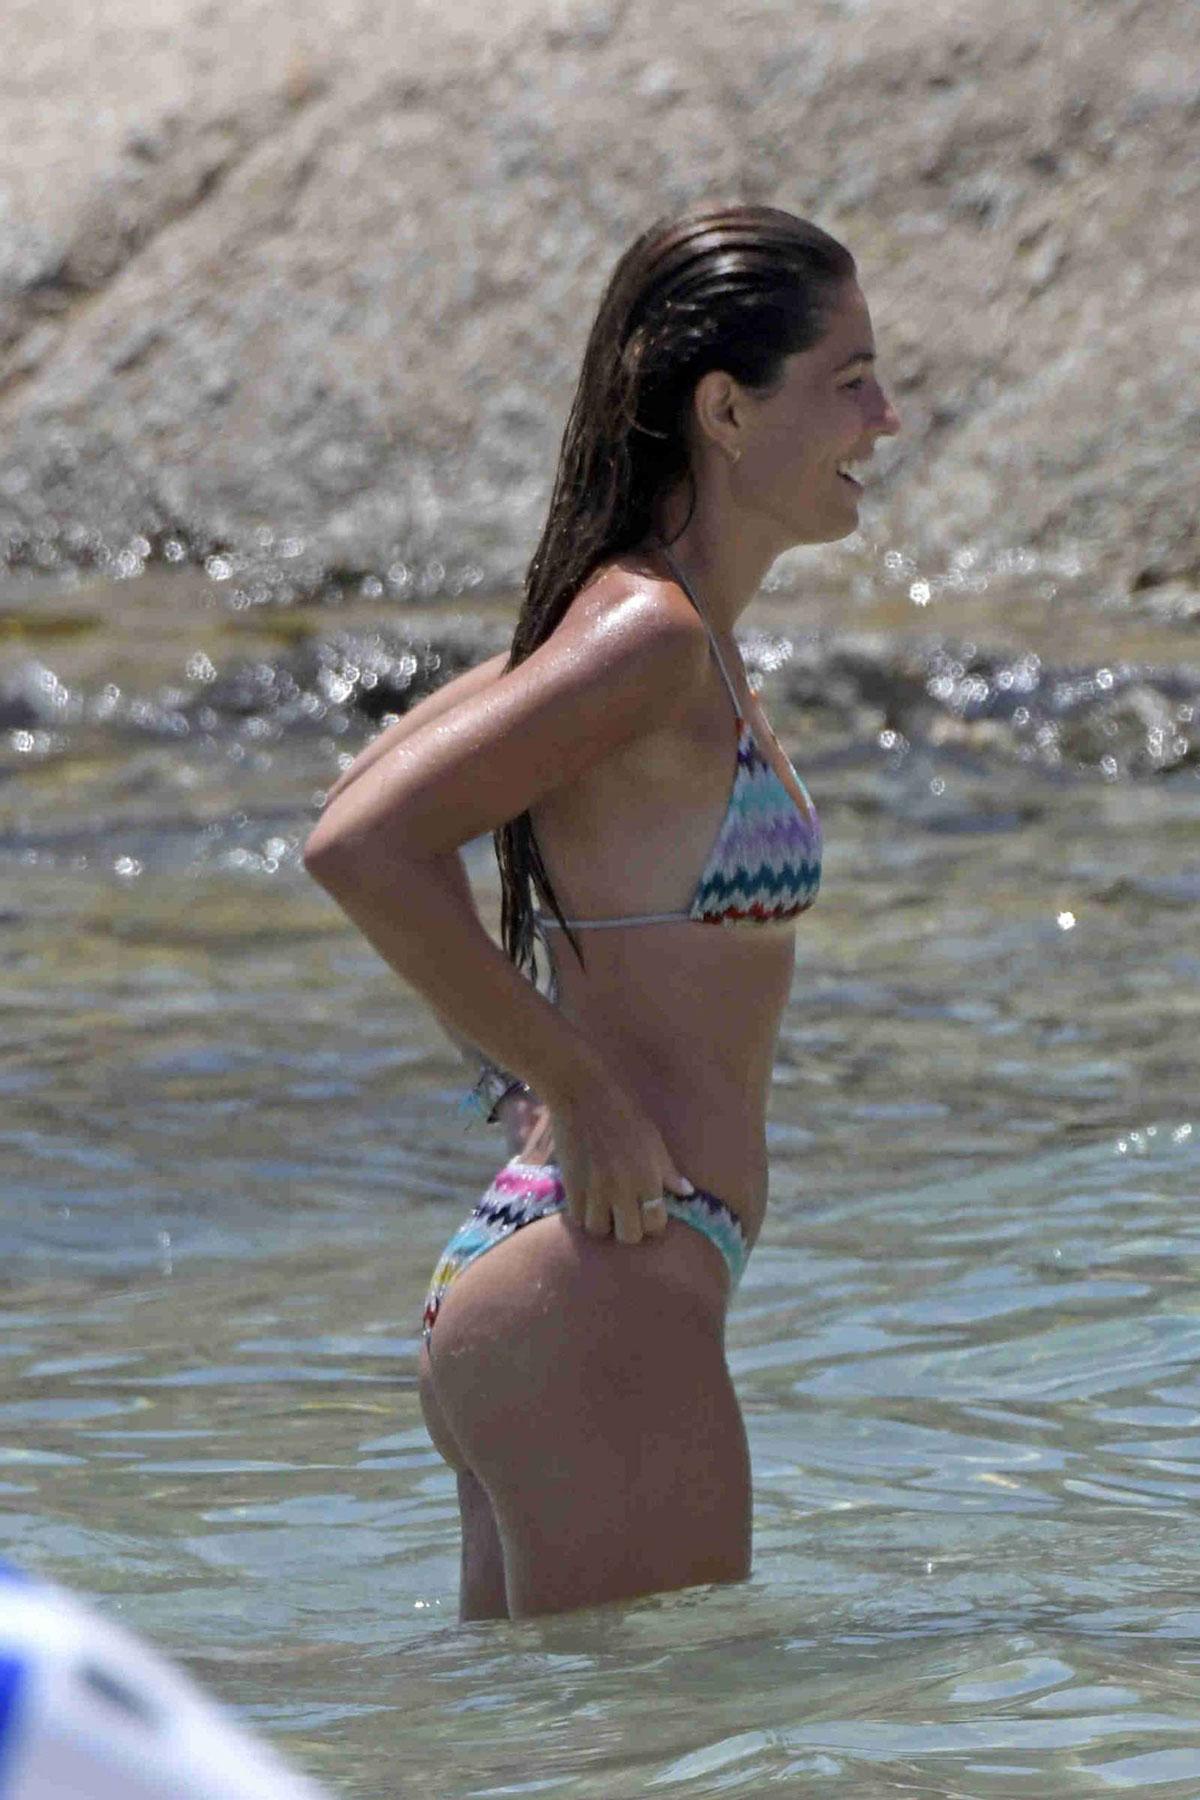 Bikini Coral Simanovich nudes (18 photo), Sexy, Cleavage, Instagram, lingerie 2015